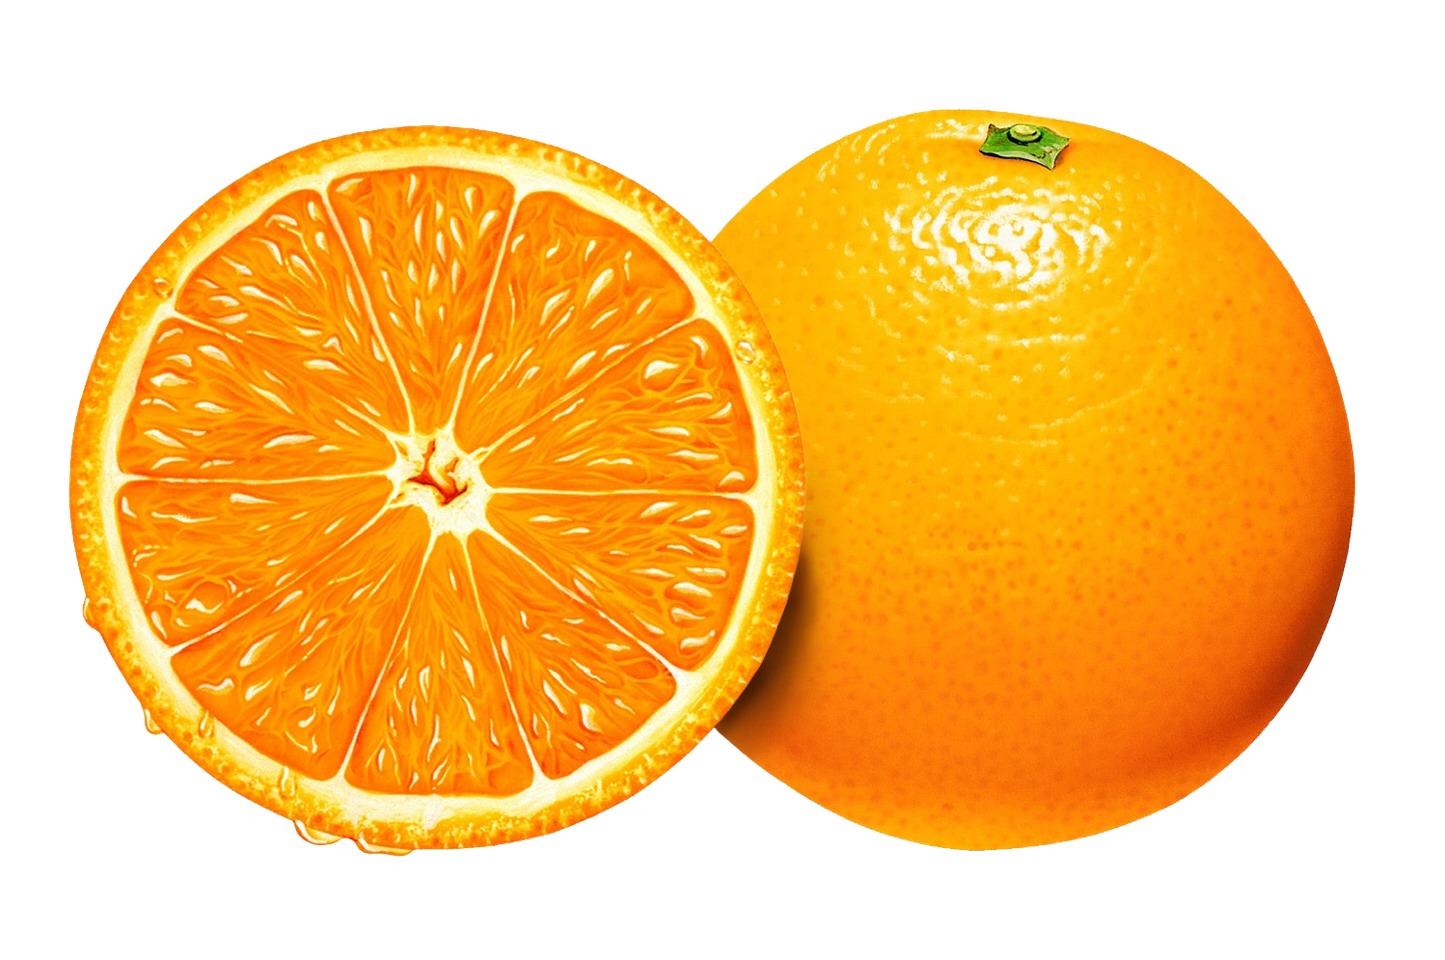 and orange juice until smooth and enjoy :)